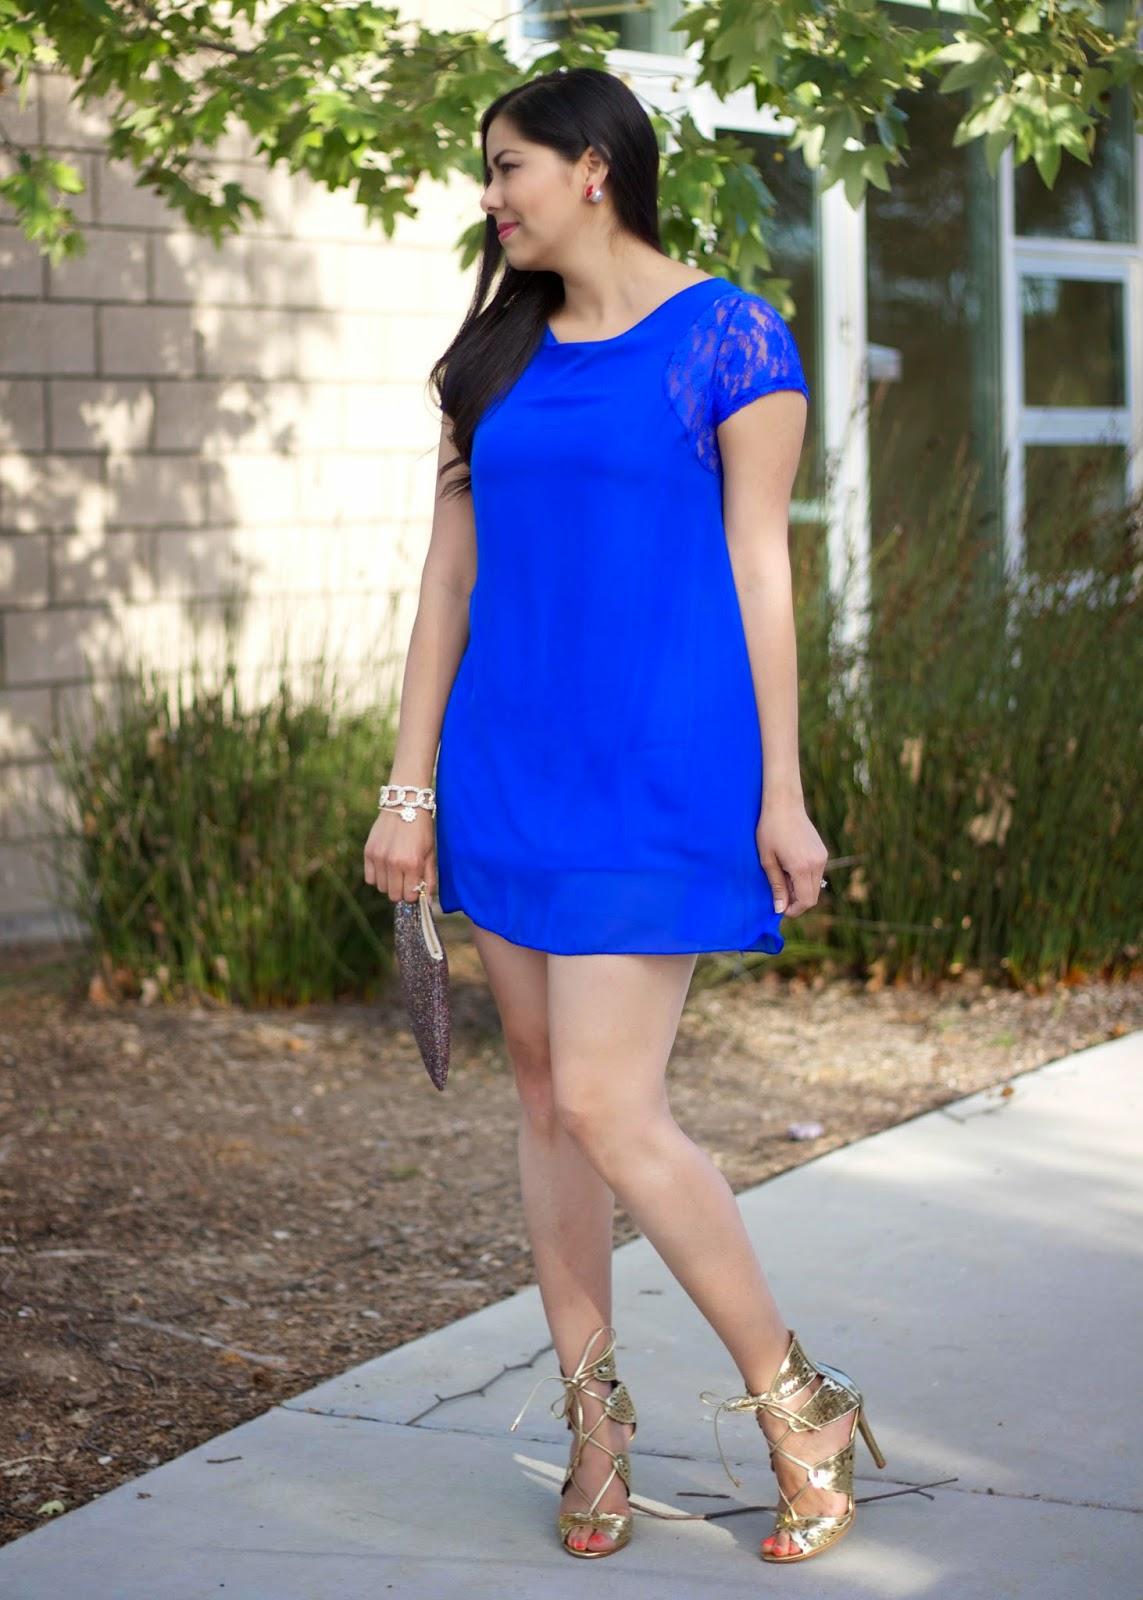 San Diego Fashion, SD Fashion Blogger, San Diego street style, sd girls night out, san diego bloggers